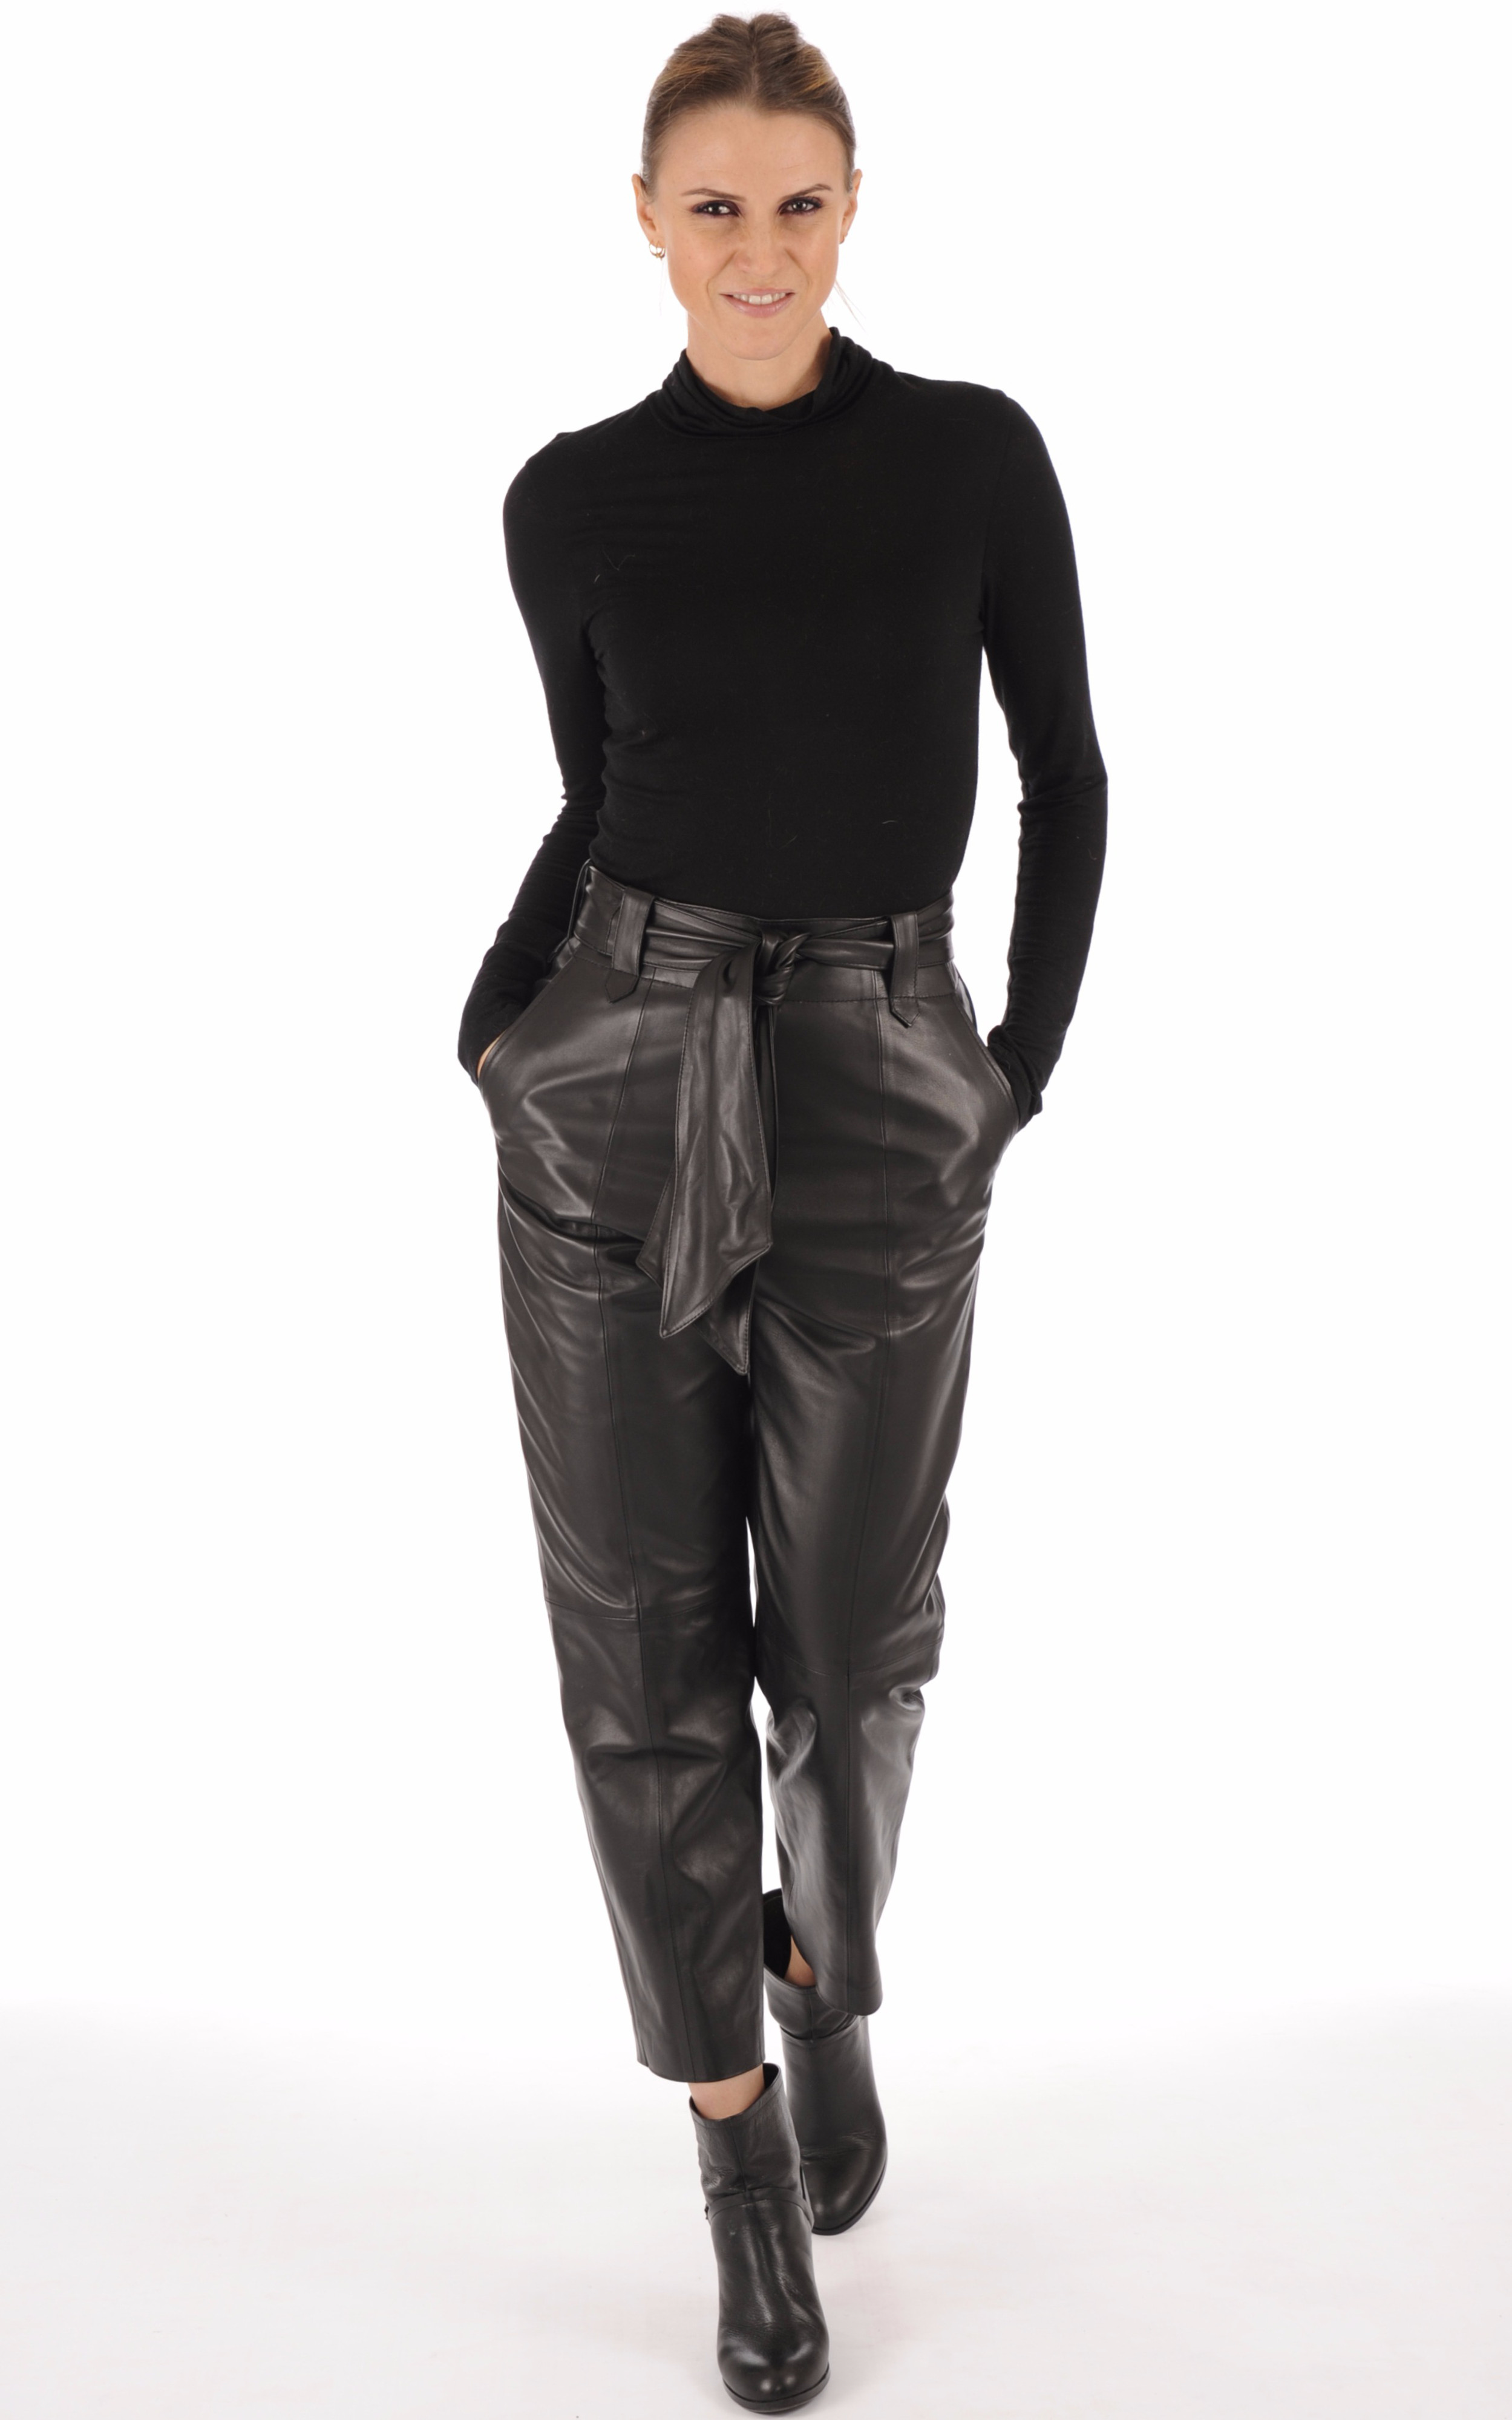 Pantalon chino agneau noir La Canadienne